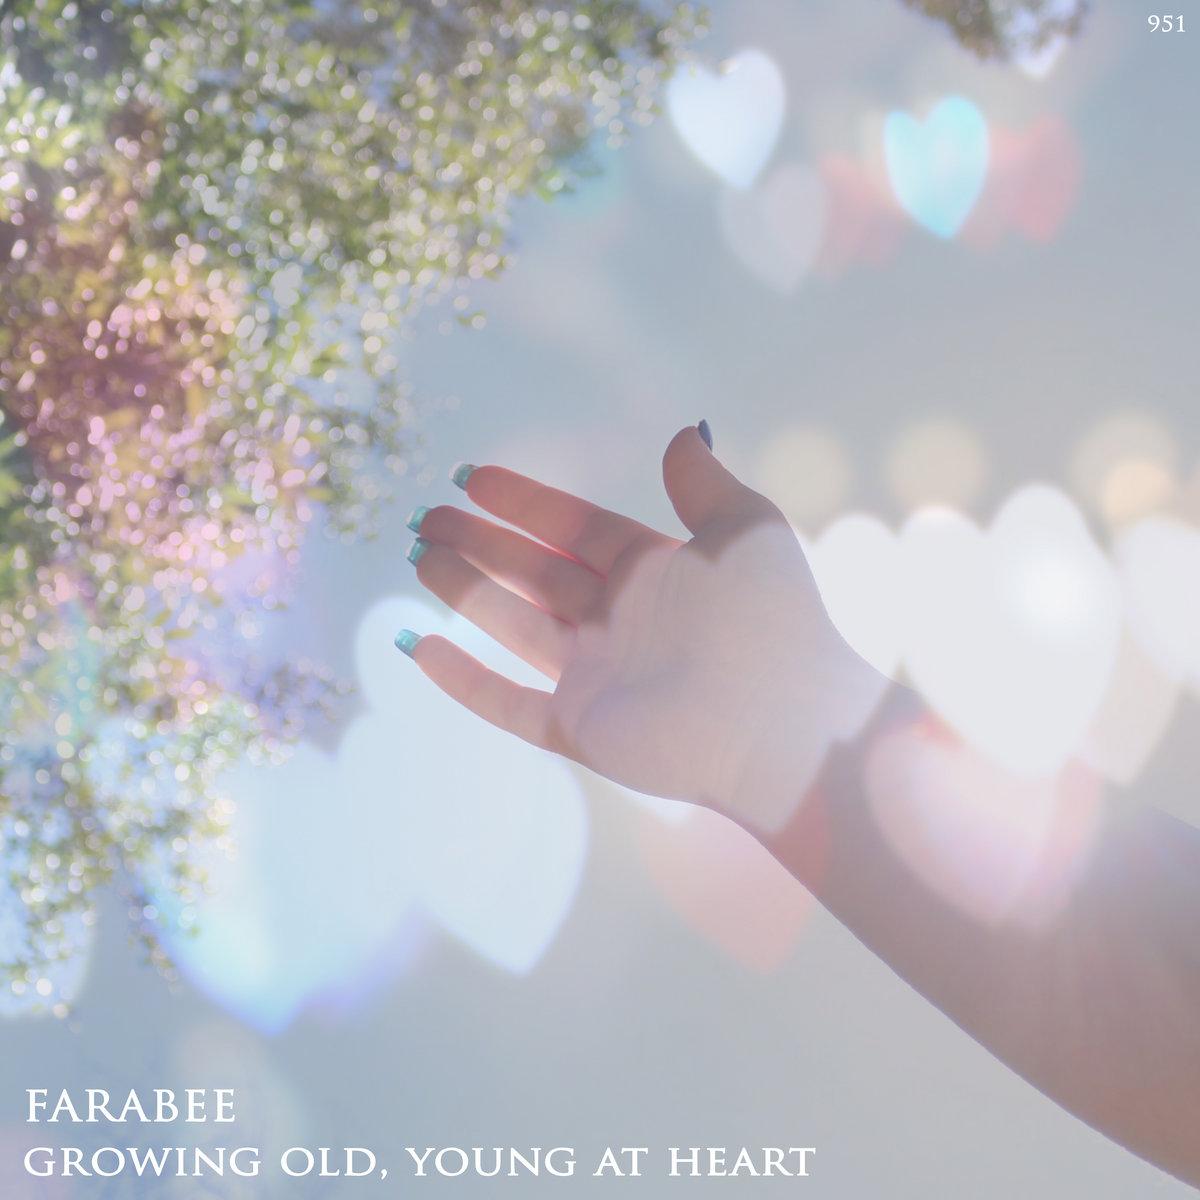 Farabee